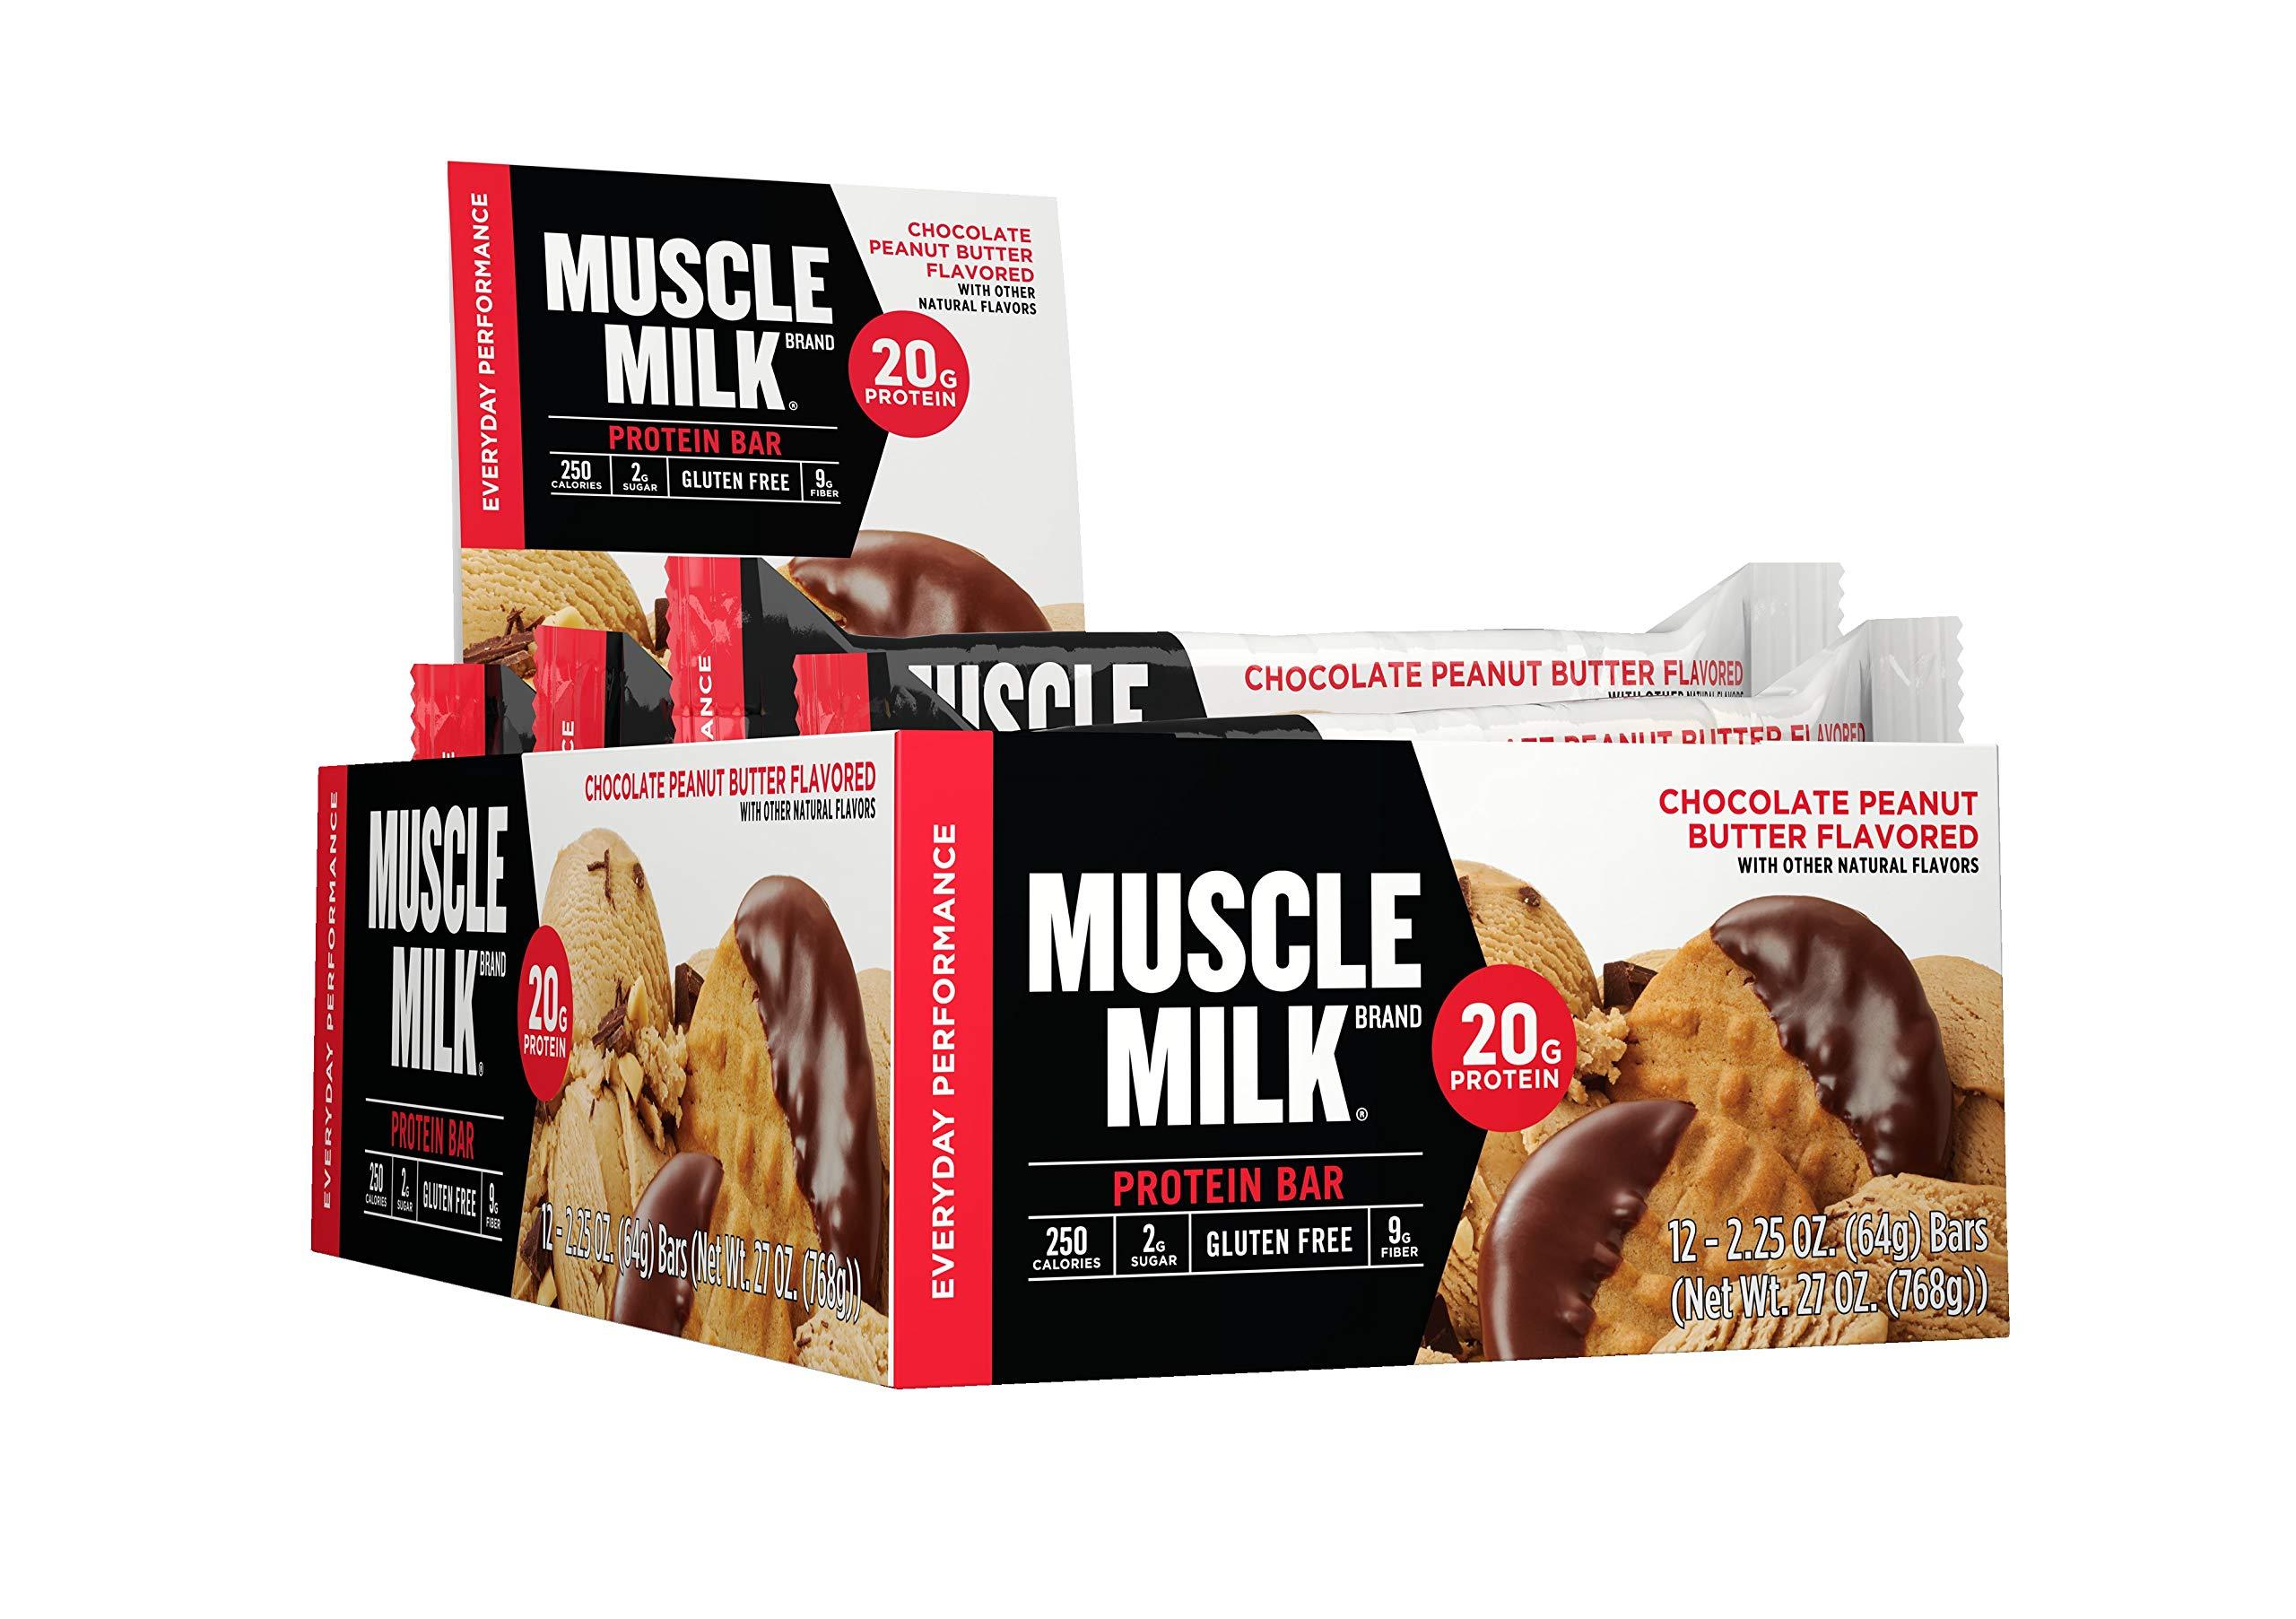 Muscle Milk Protein Bar Chocolate Peanut Butter 20g 225 Oz 12